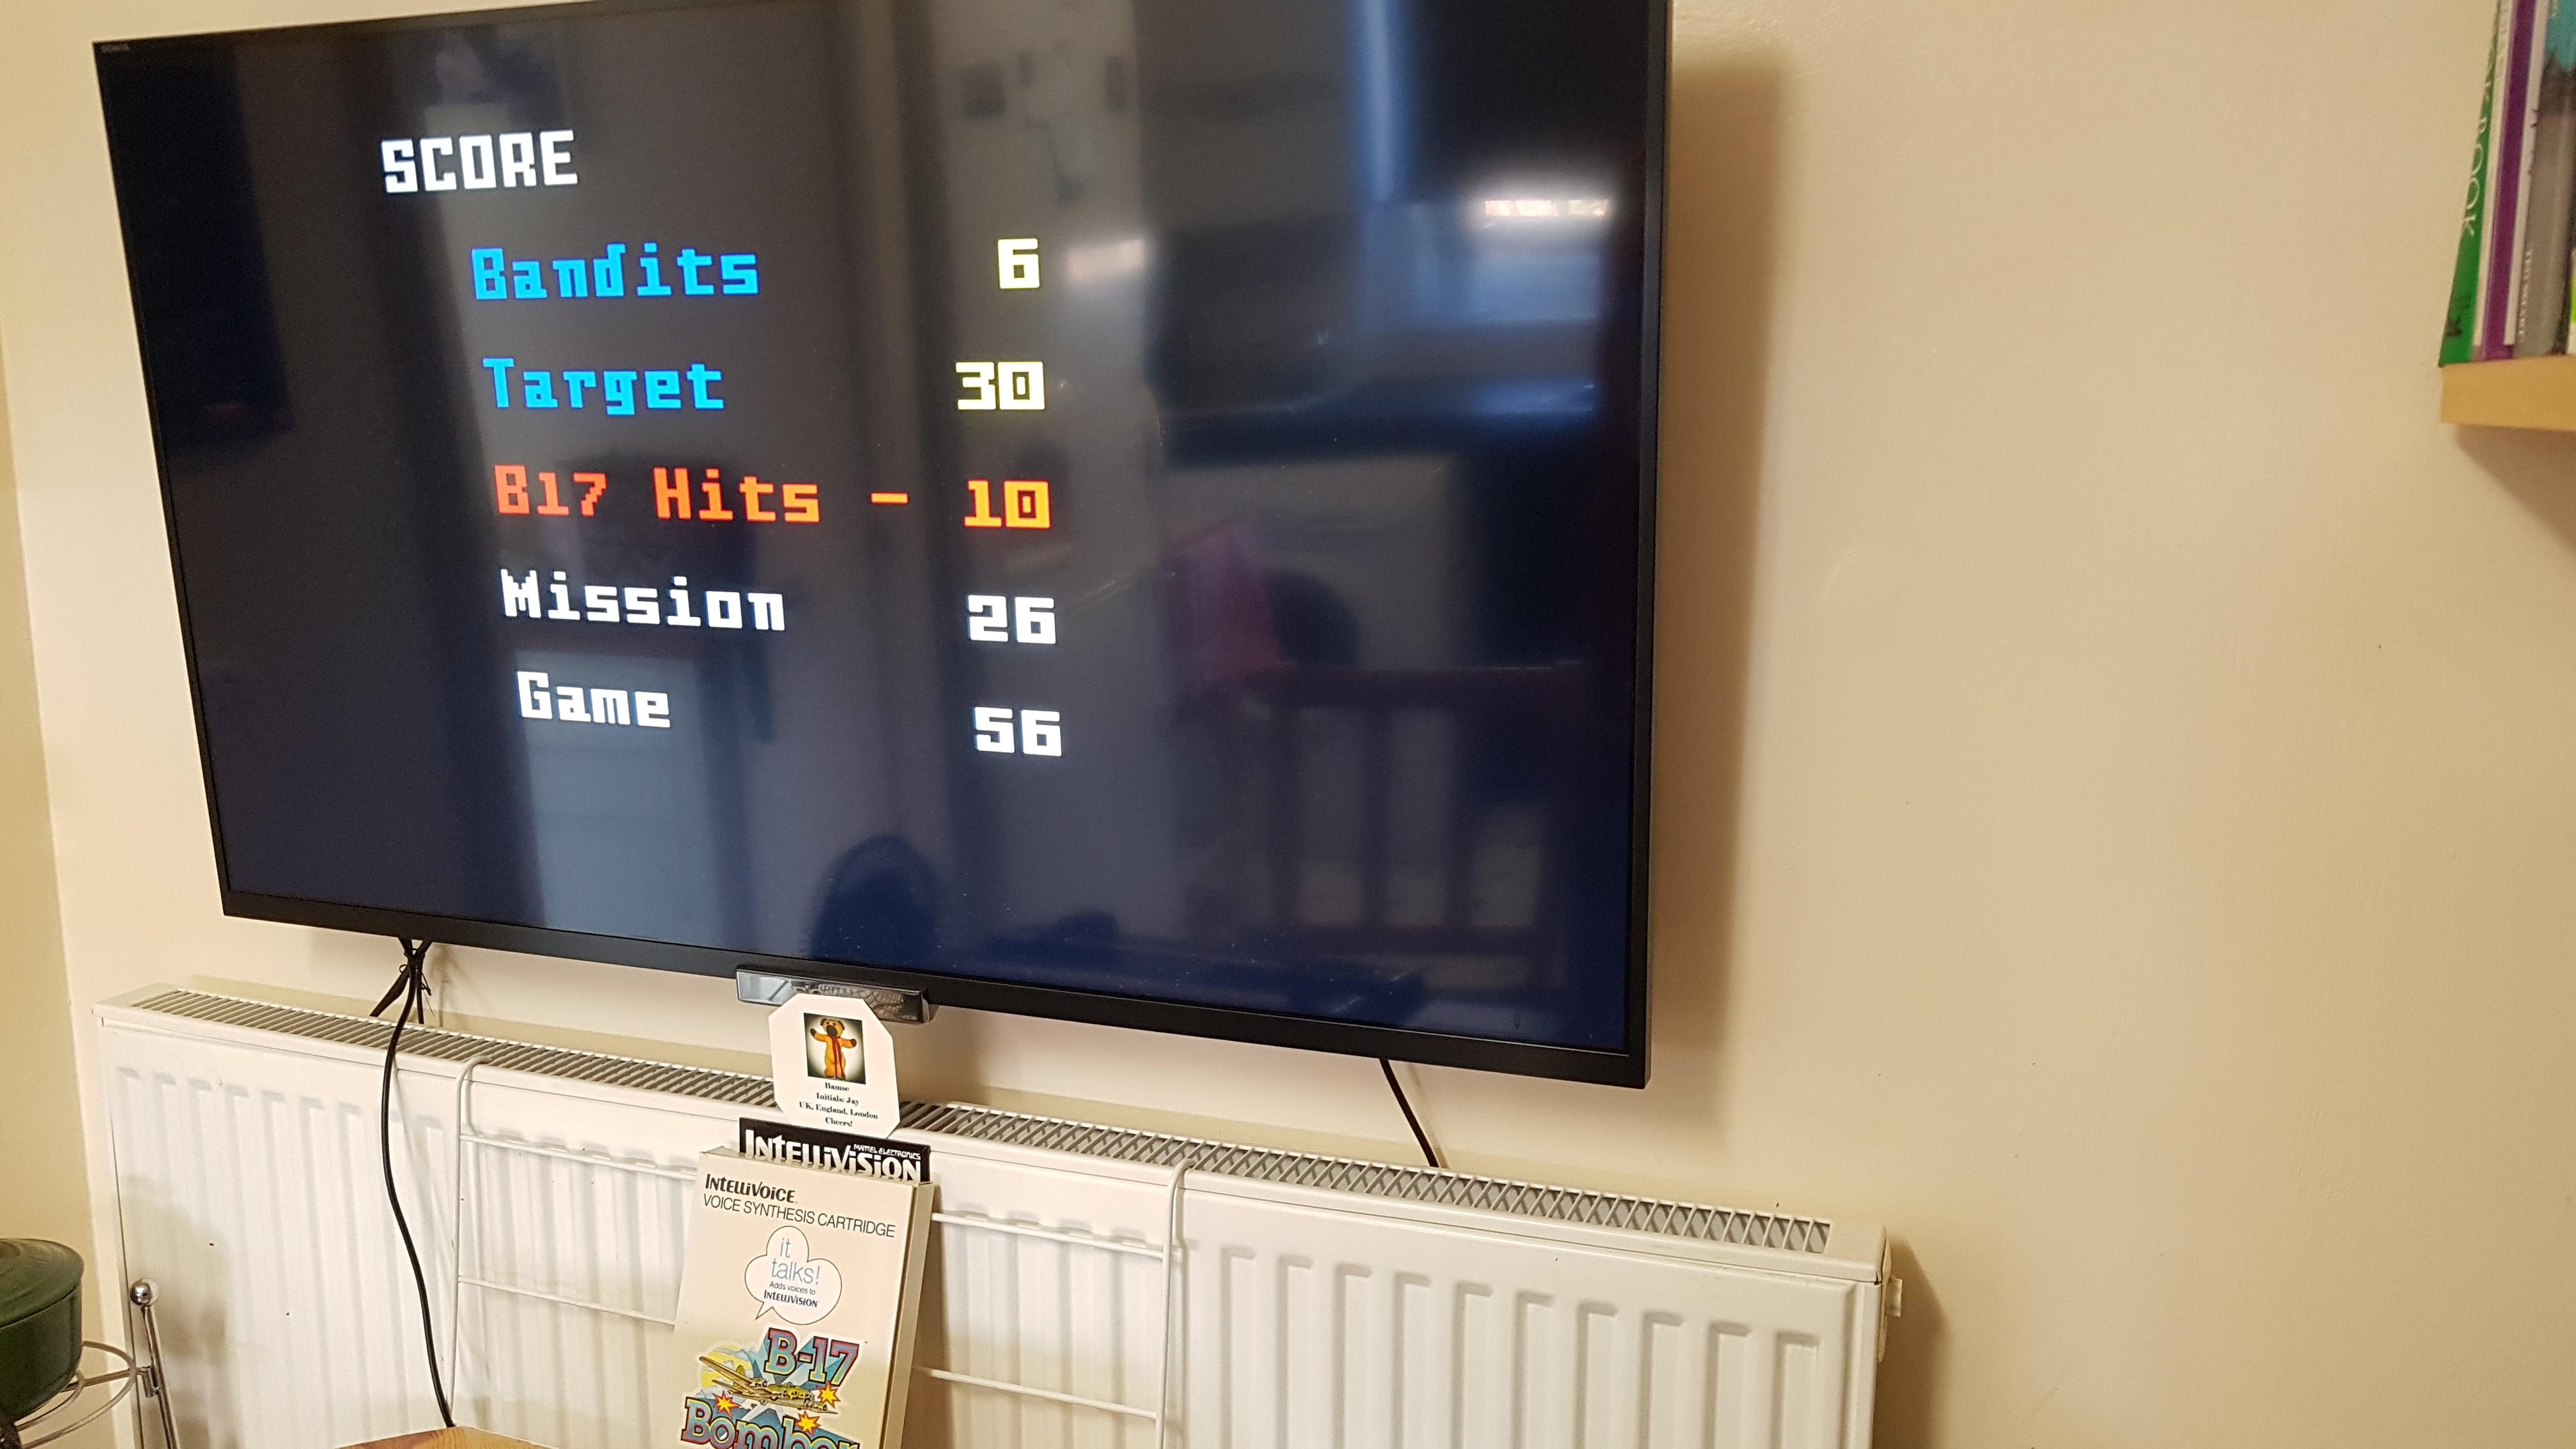 Bamse: B17 Bomber [Level 2] (Intellivision) 56 points on 2019-02-24 08:11:26